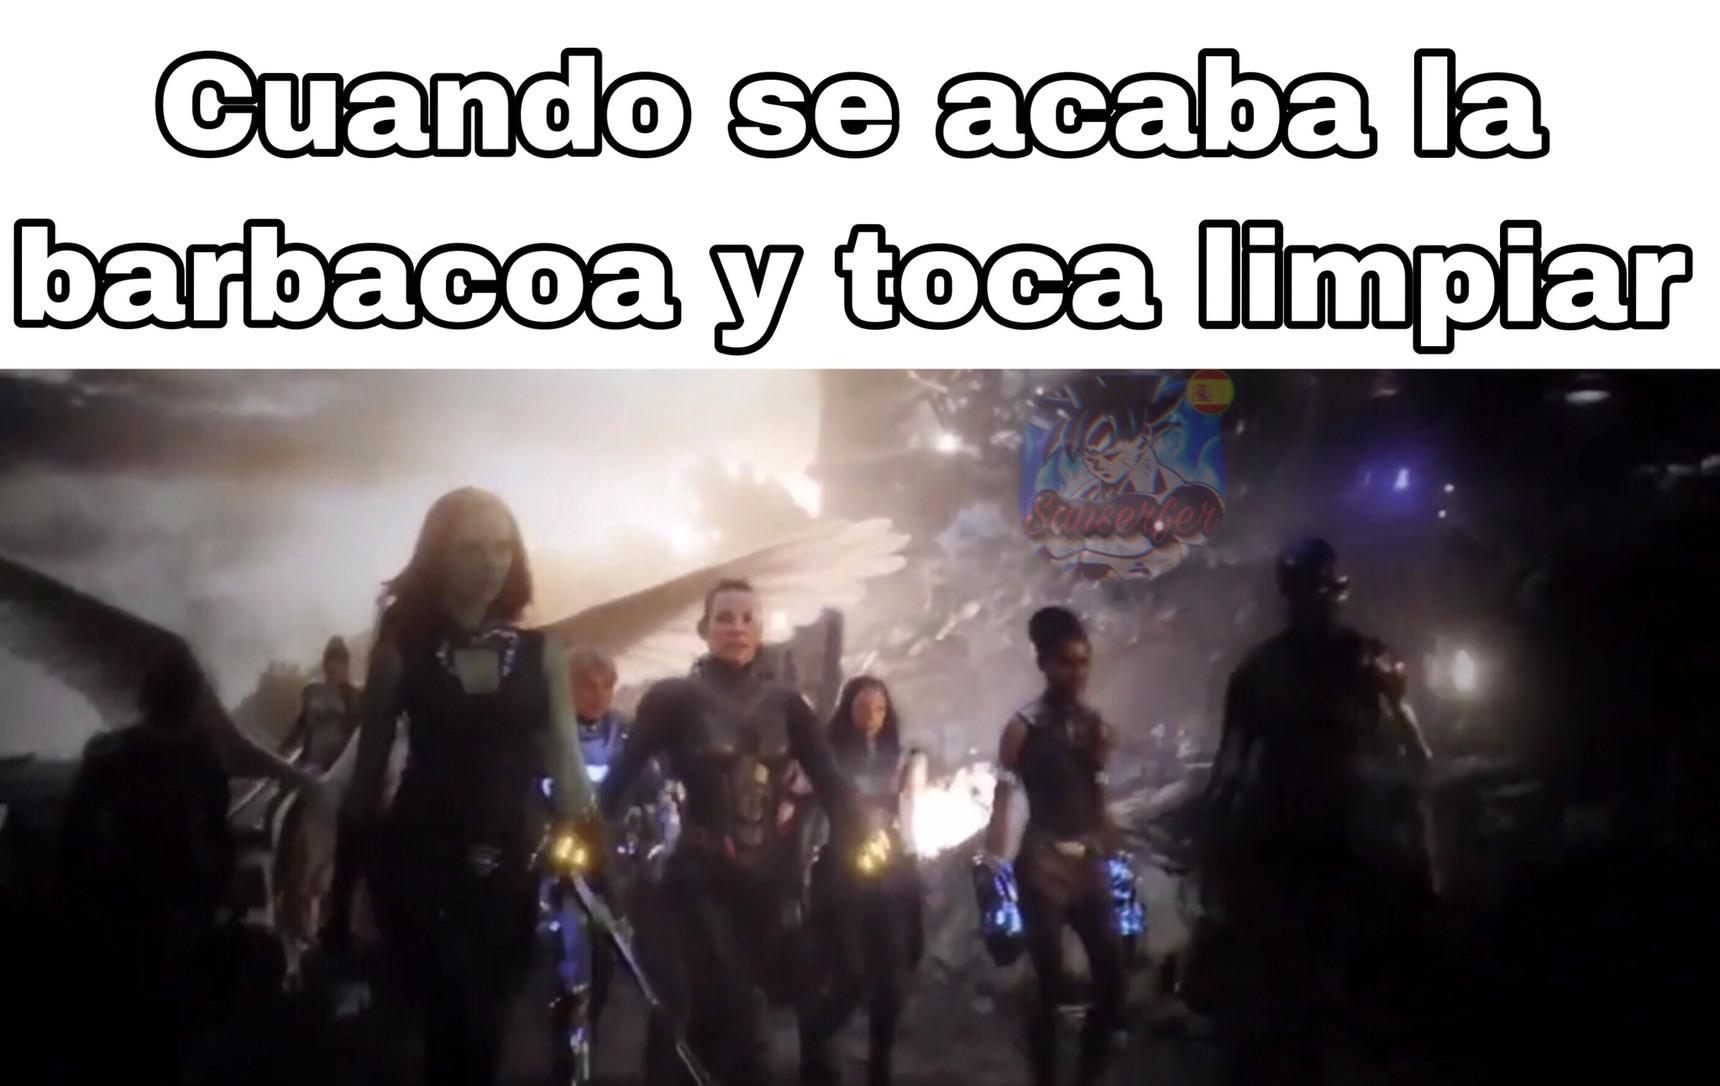 recien horneado - meme